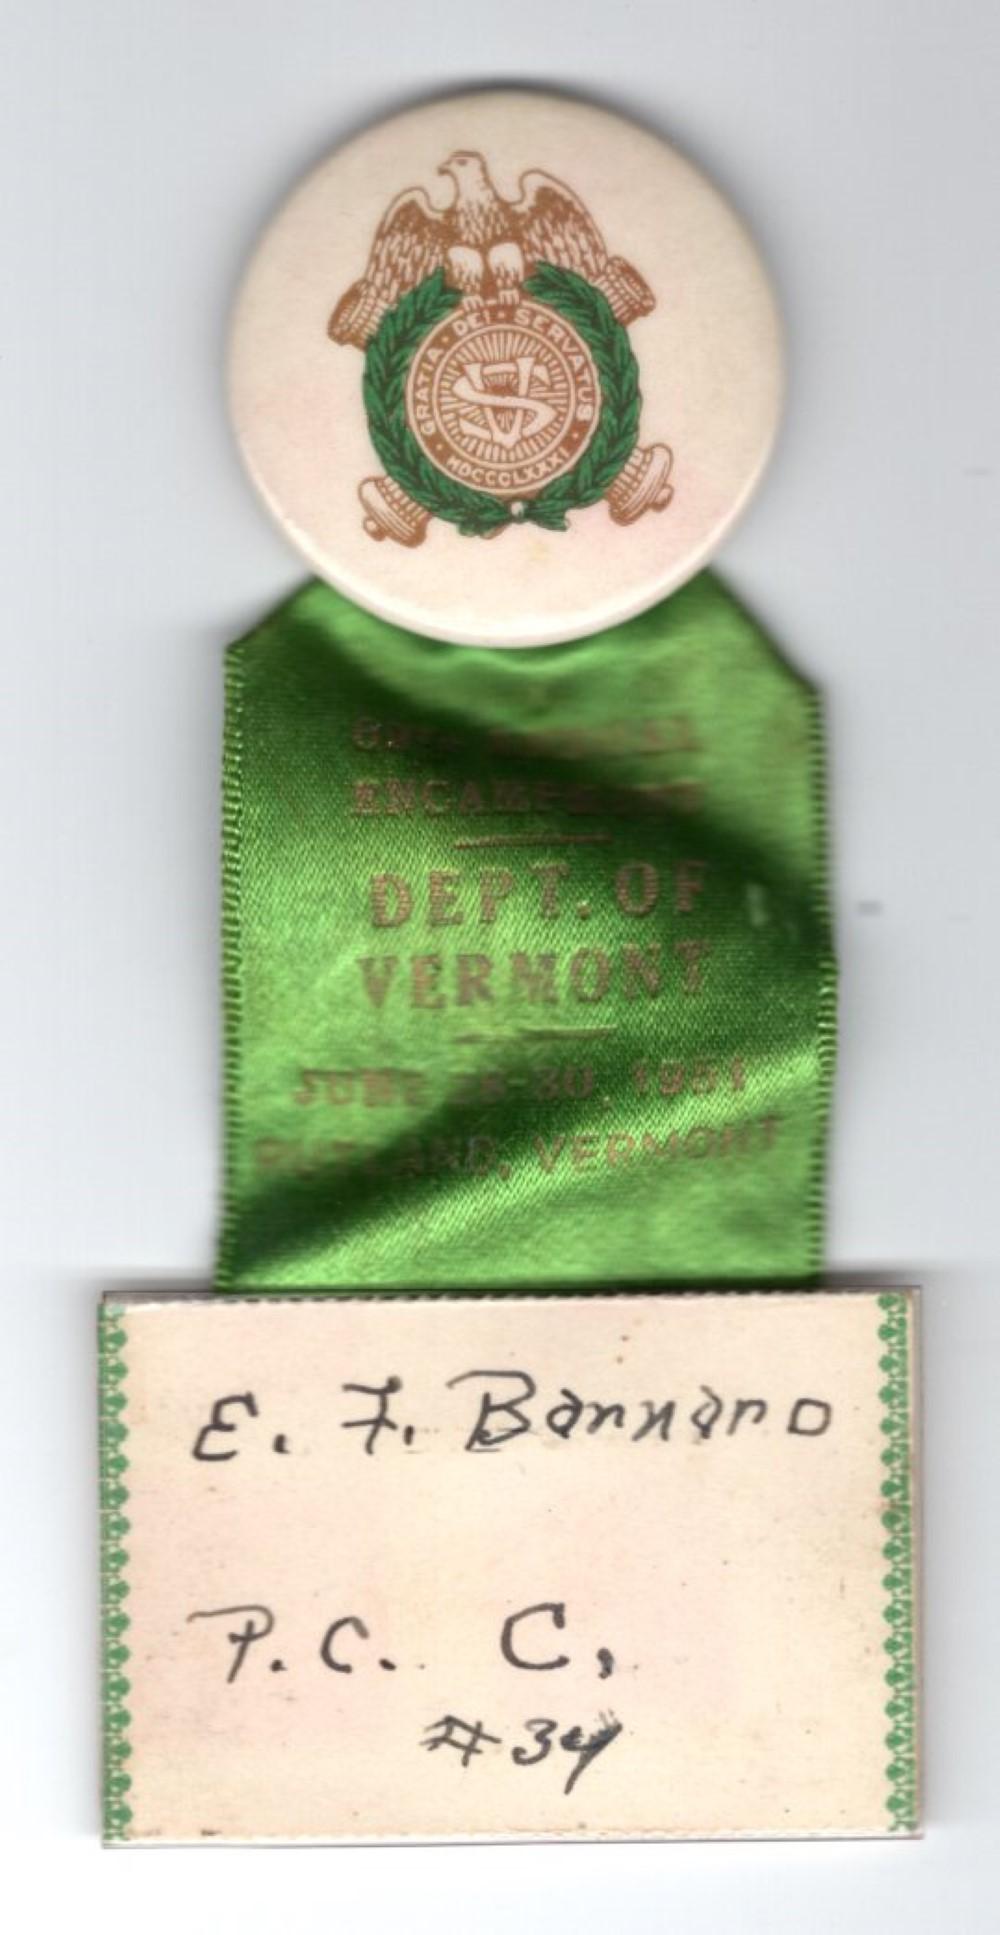 Sons of Union Veterans Vermont ribbon, 1951